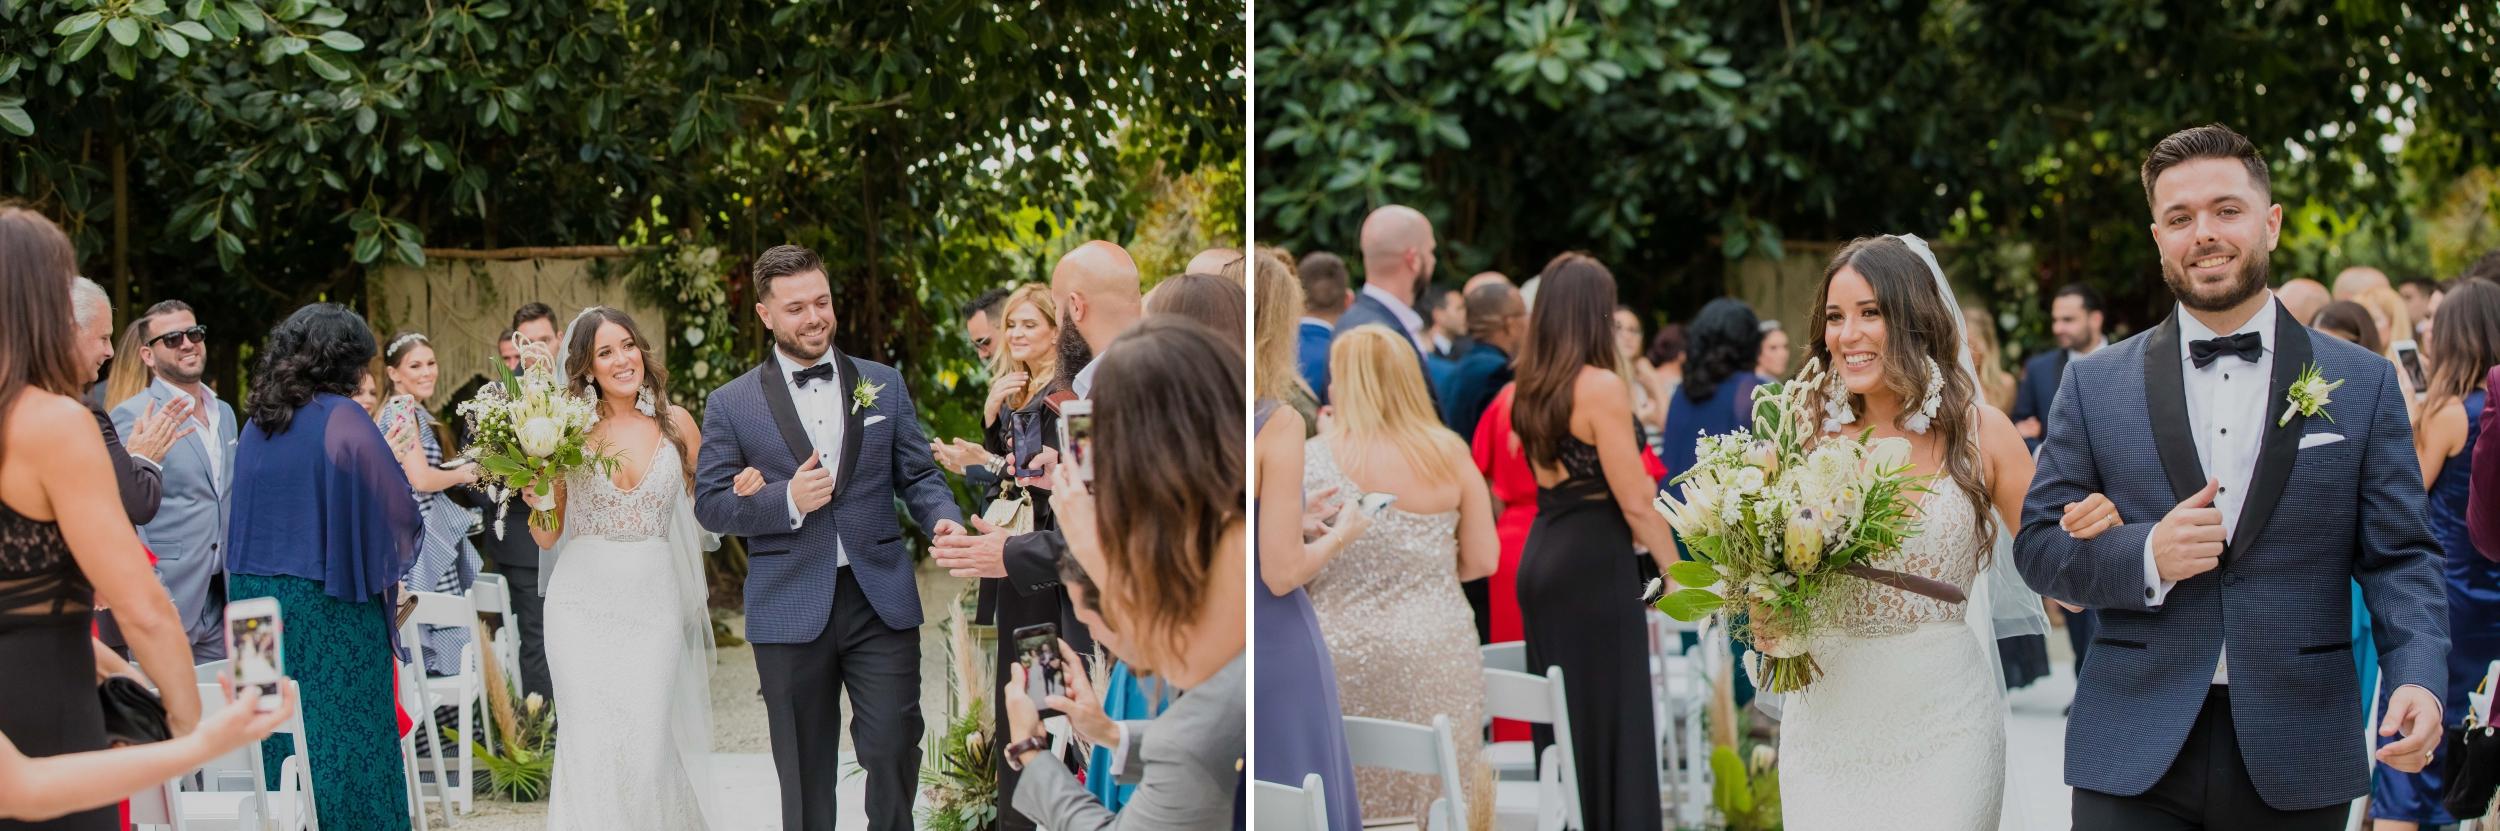 Wedding Whimsical Key West House  - Photography by Santy Martinez 15.jpg